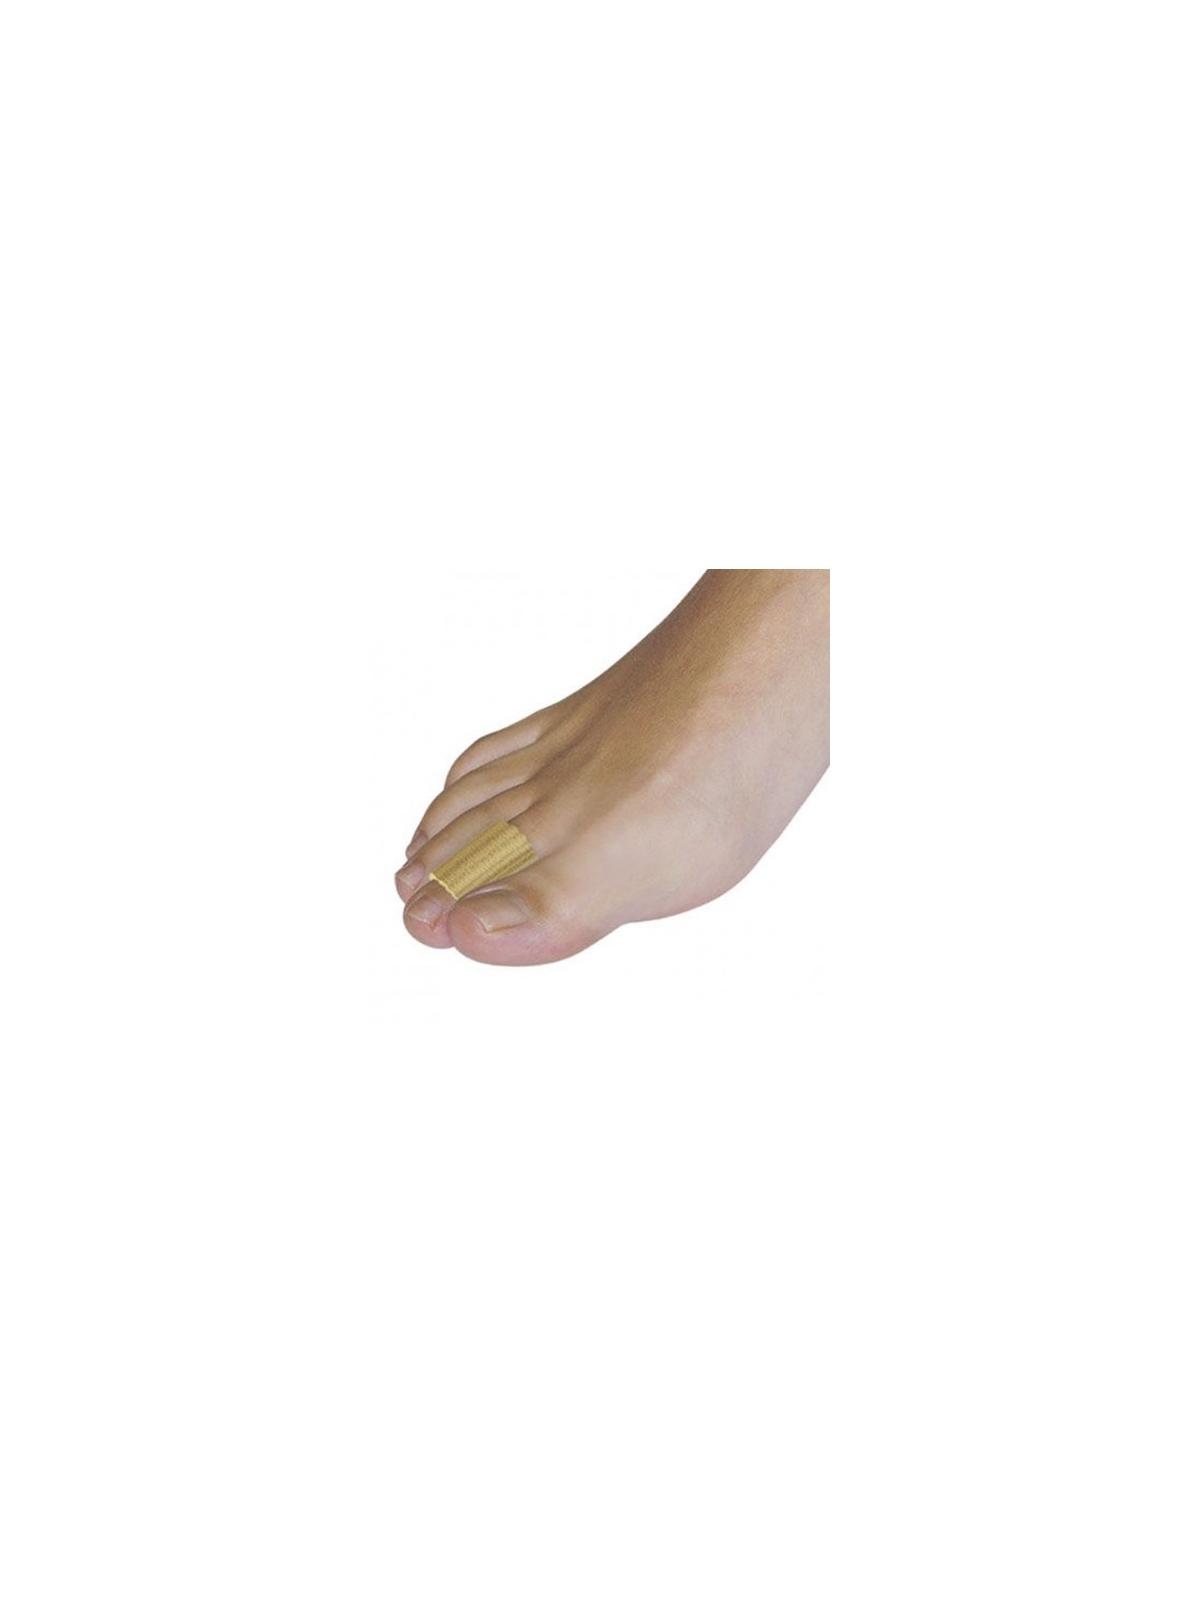 Tubo Elástico Recortable con gel forrado Herbi Feet